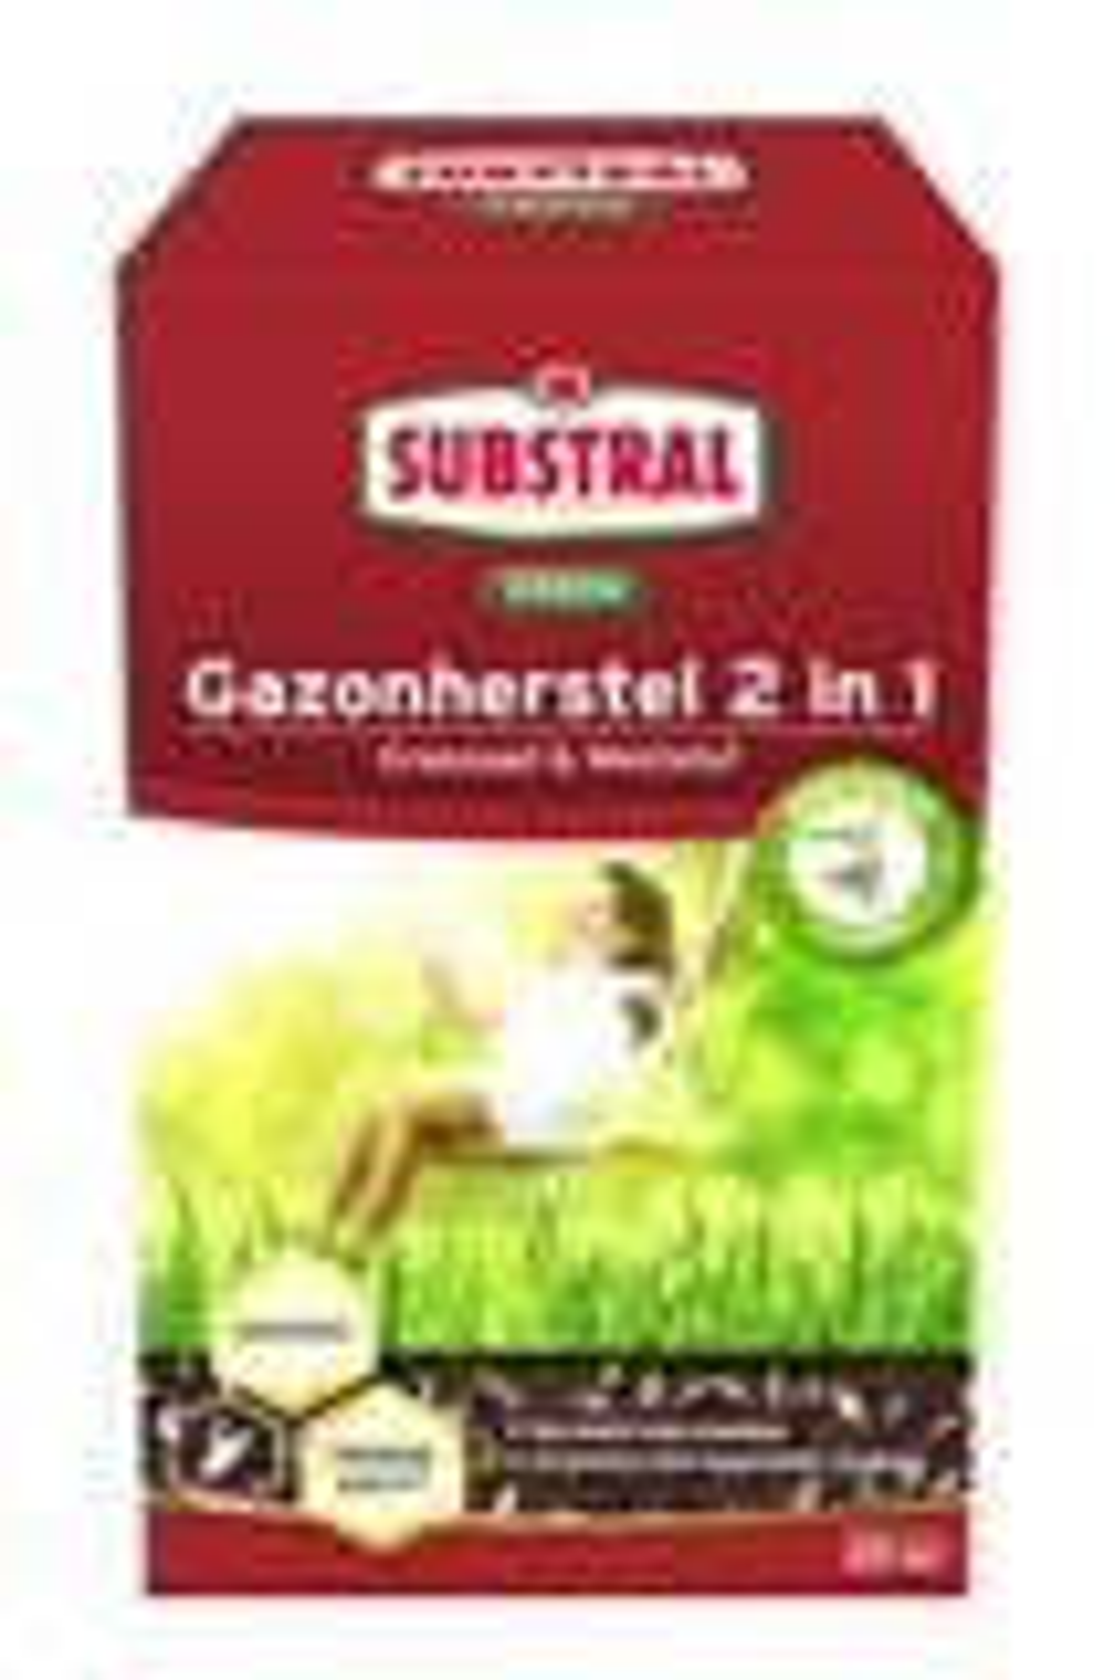 Substral gazonherstel graszaad & meststof 2-in-1 - 20m²